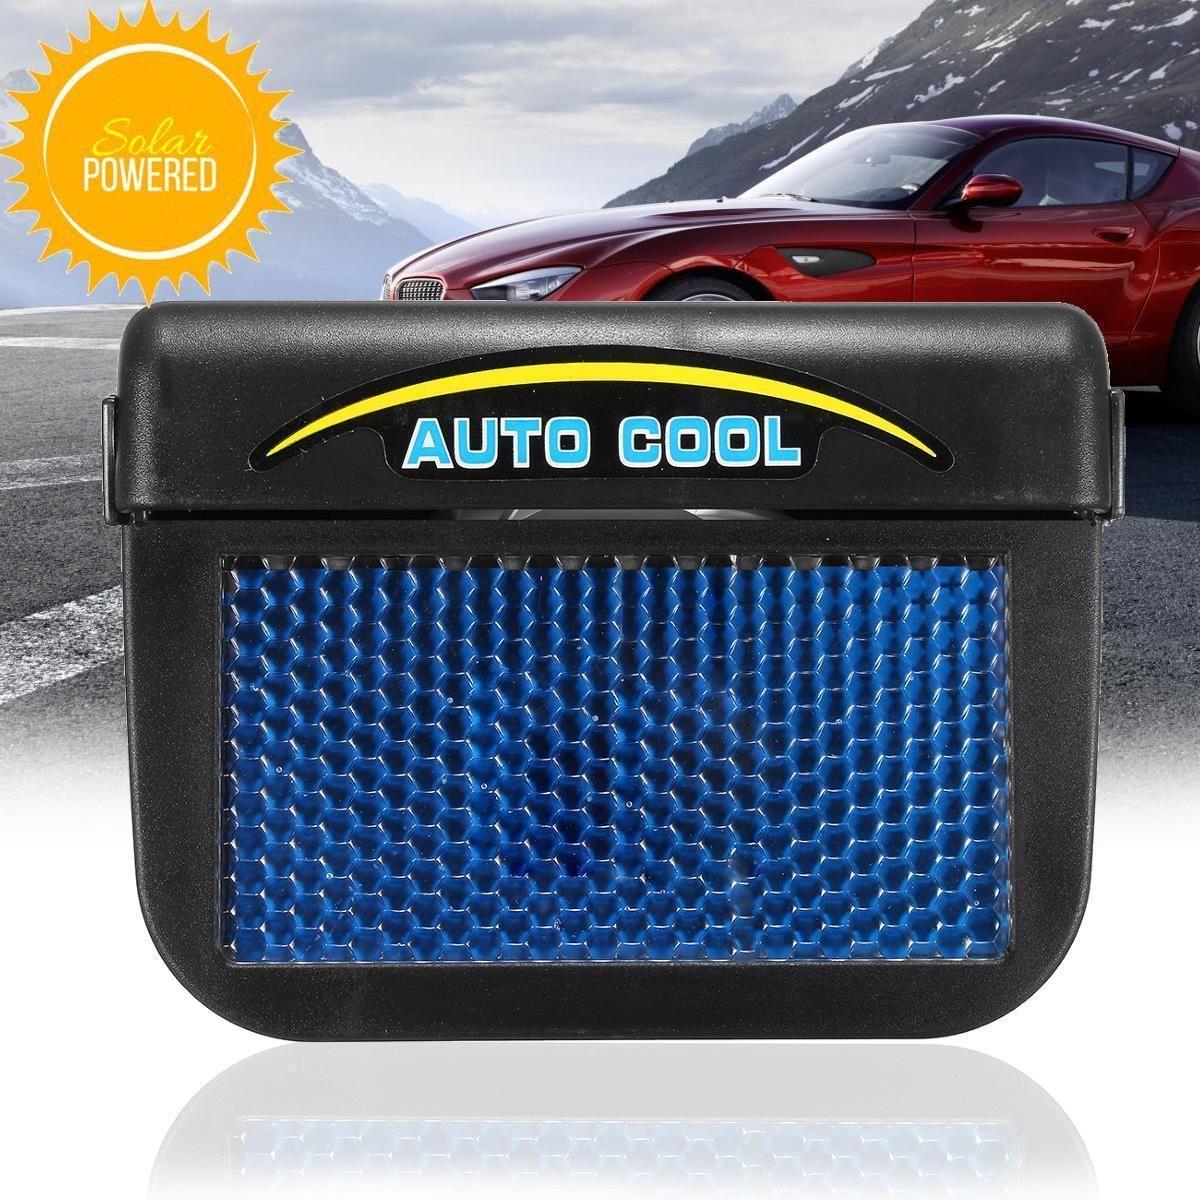 autocool solar car window fan auto ventilator cooler air vent fan rh pinterest com